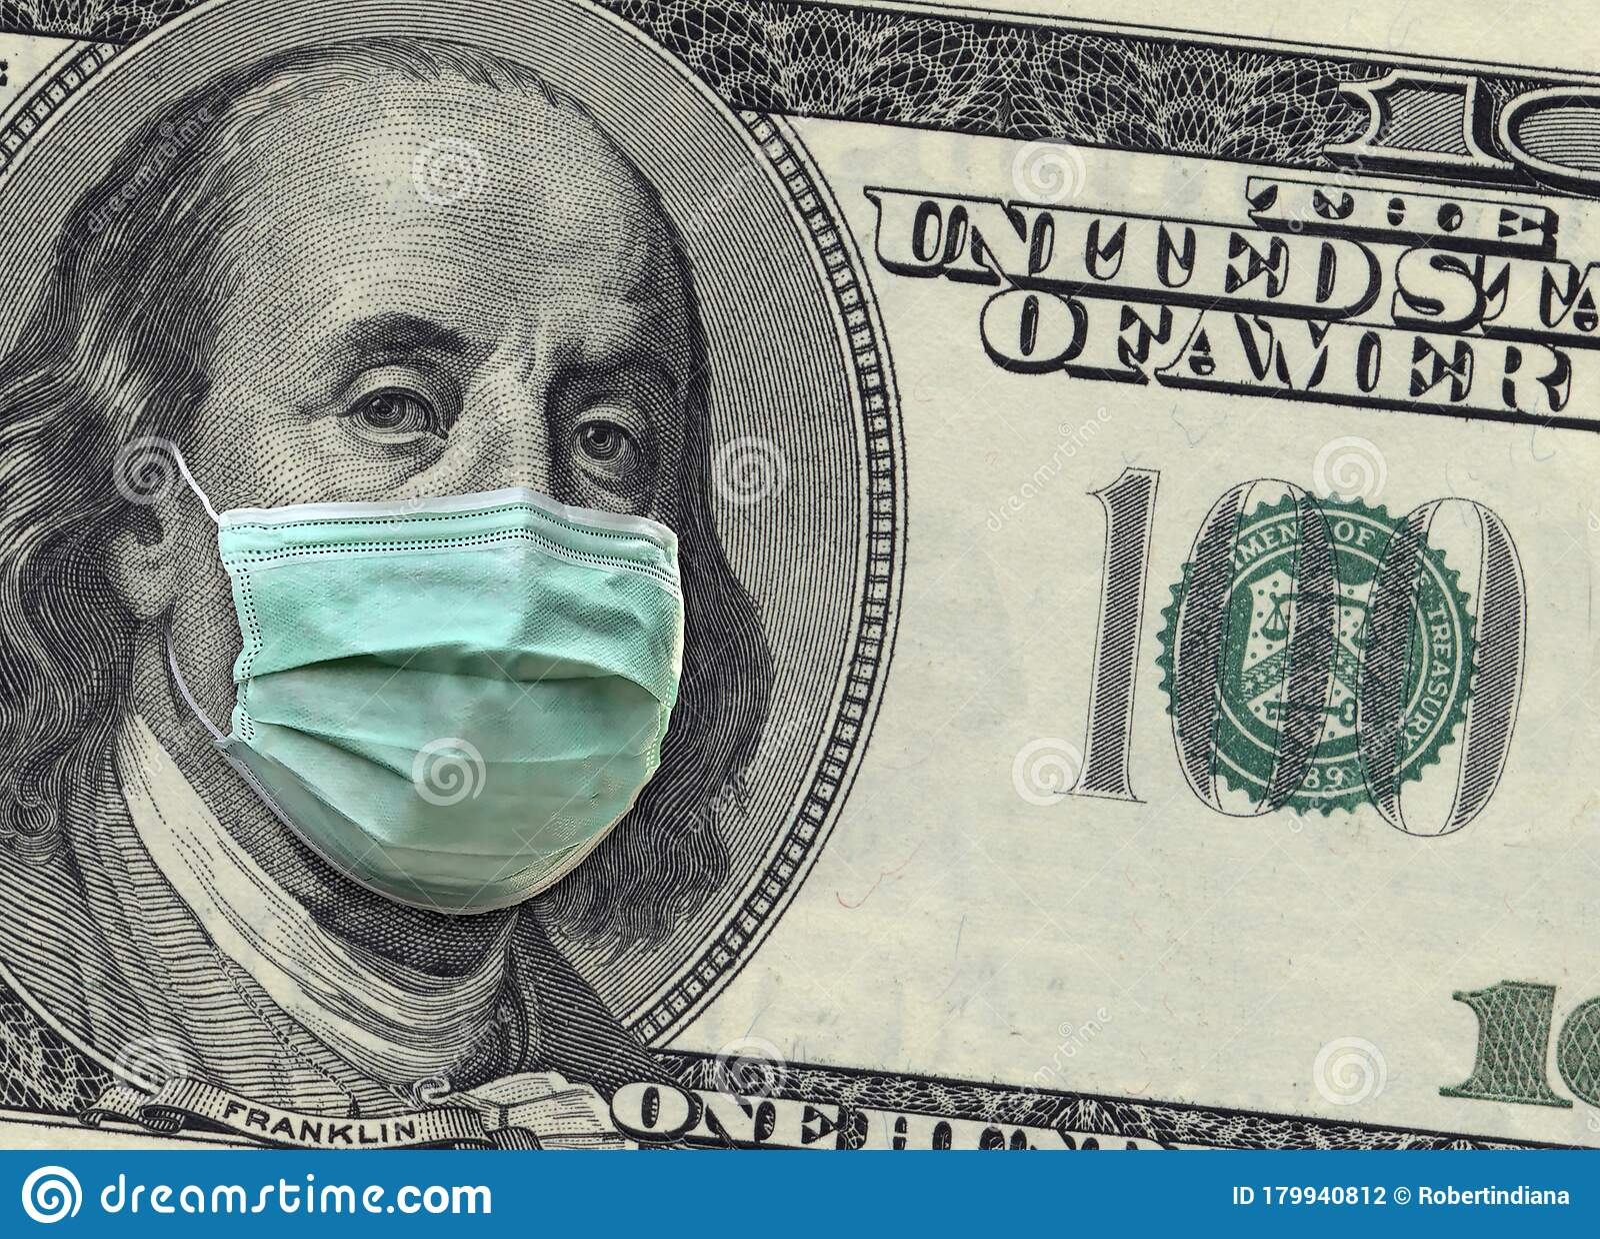 A Close Up Of A 100 Dollar Bill Shows Benjamin Franklin